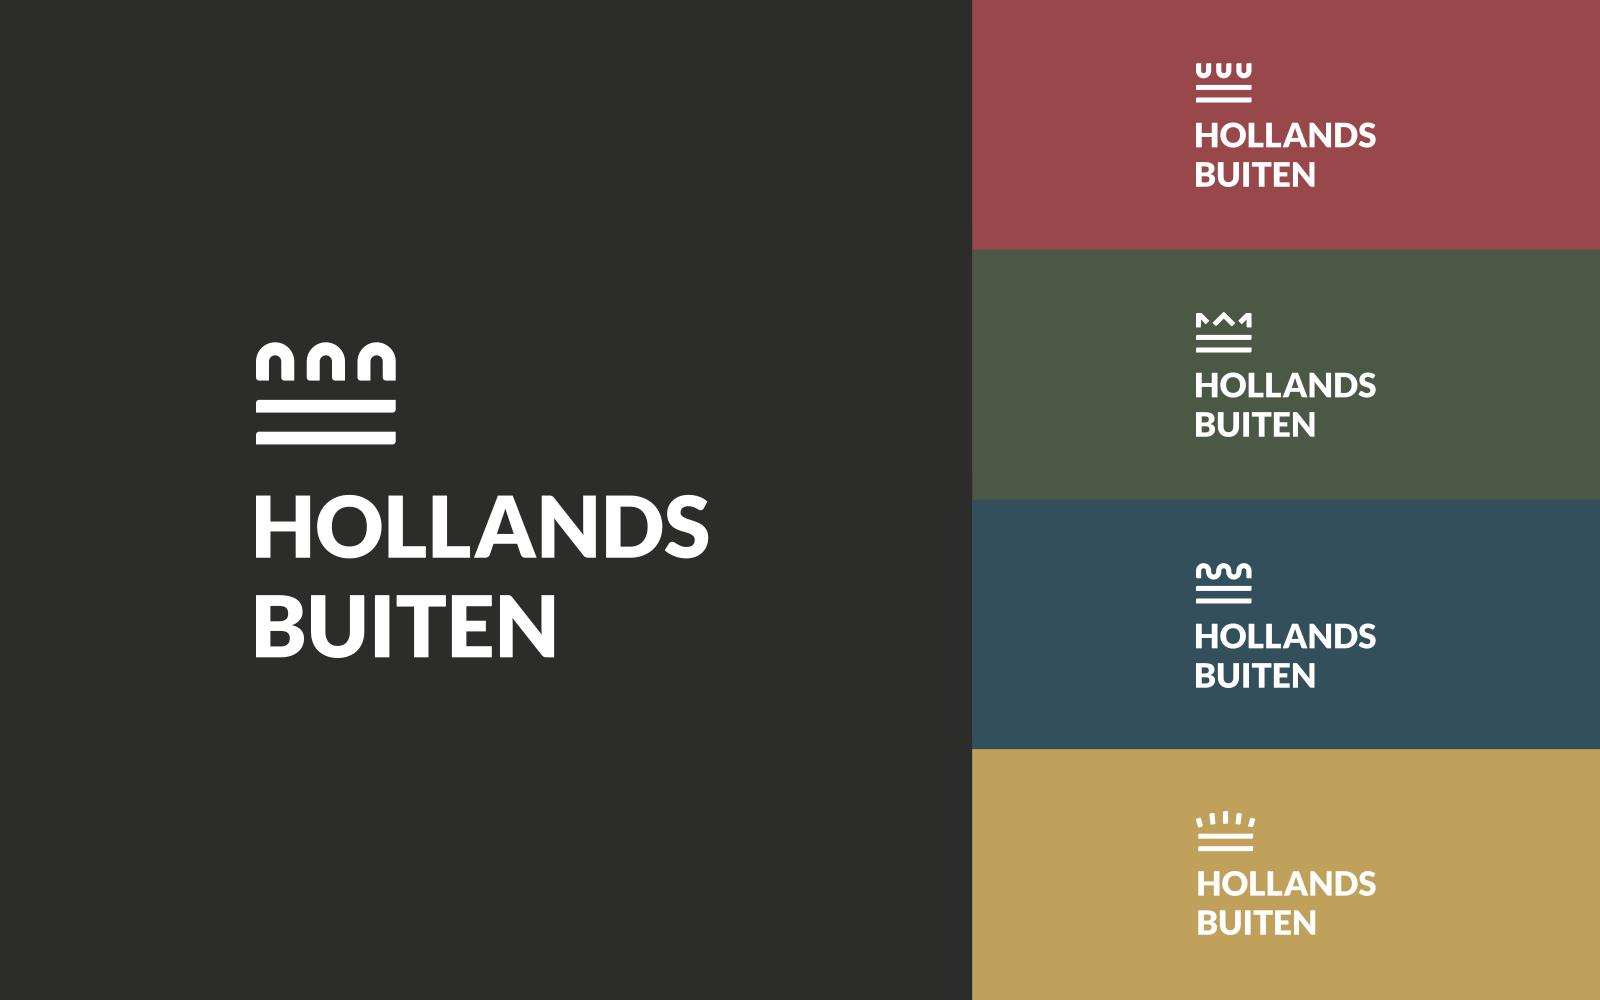 hollands-buiten-logo